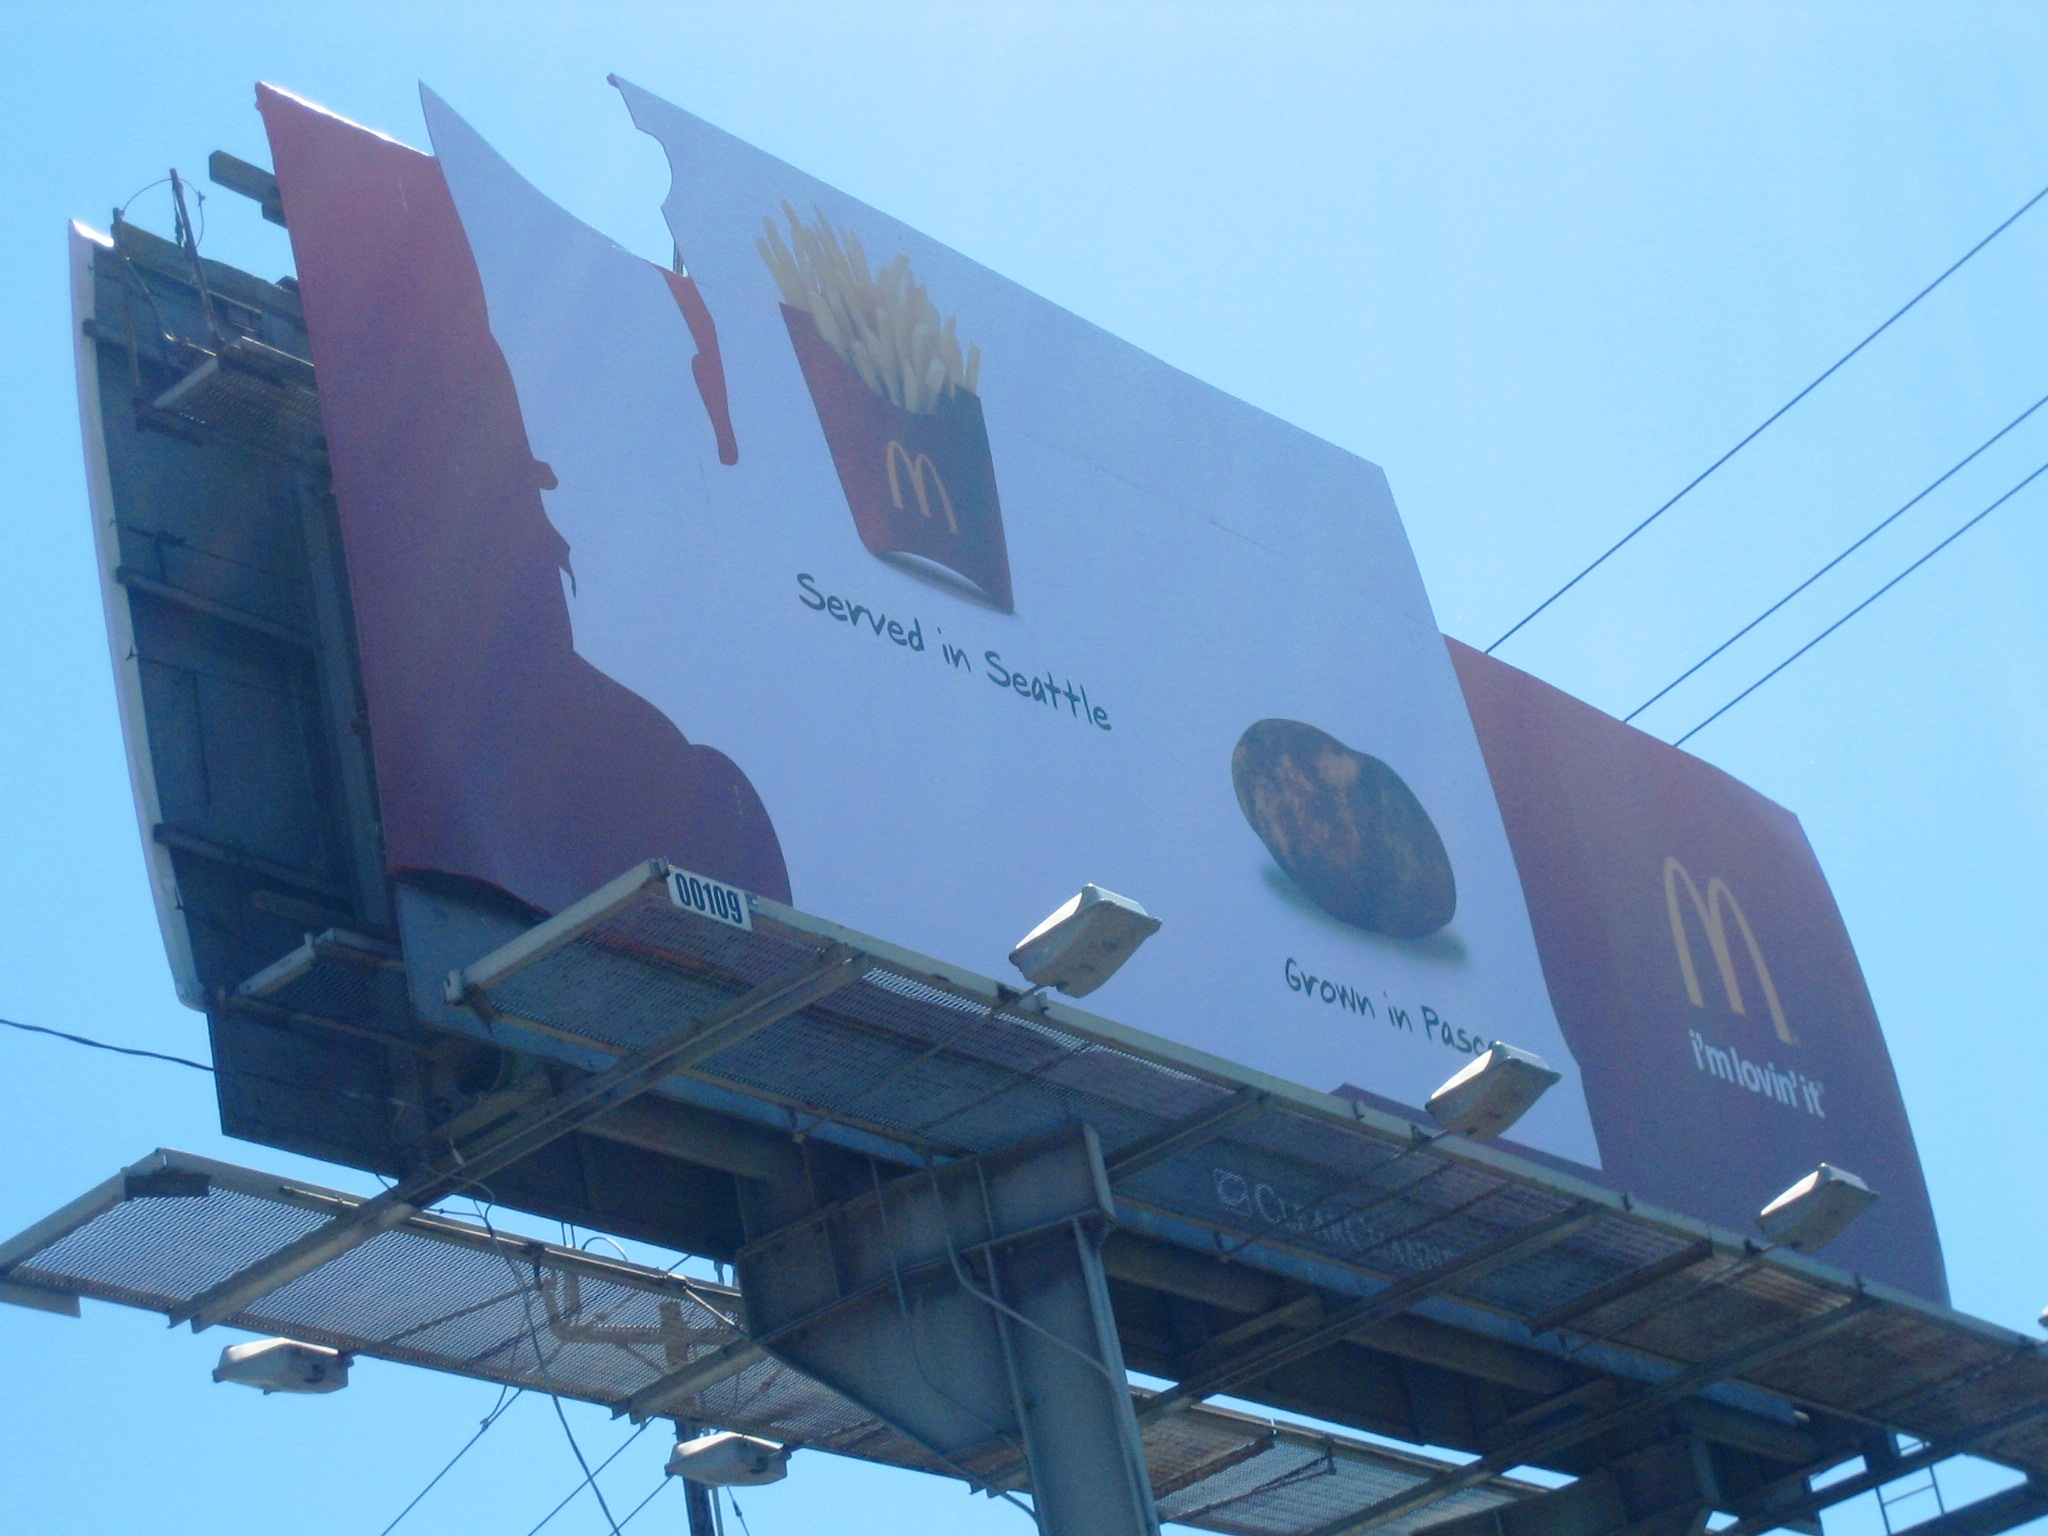 Another McDonald's billboard